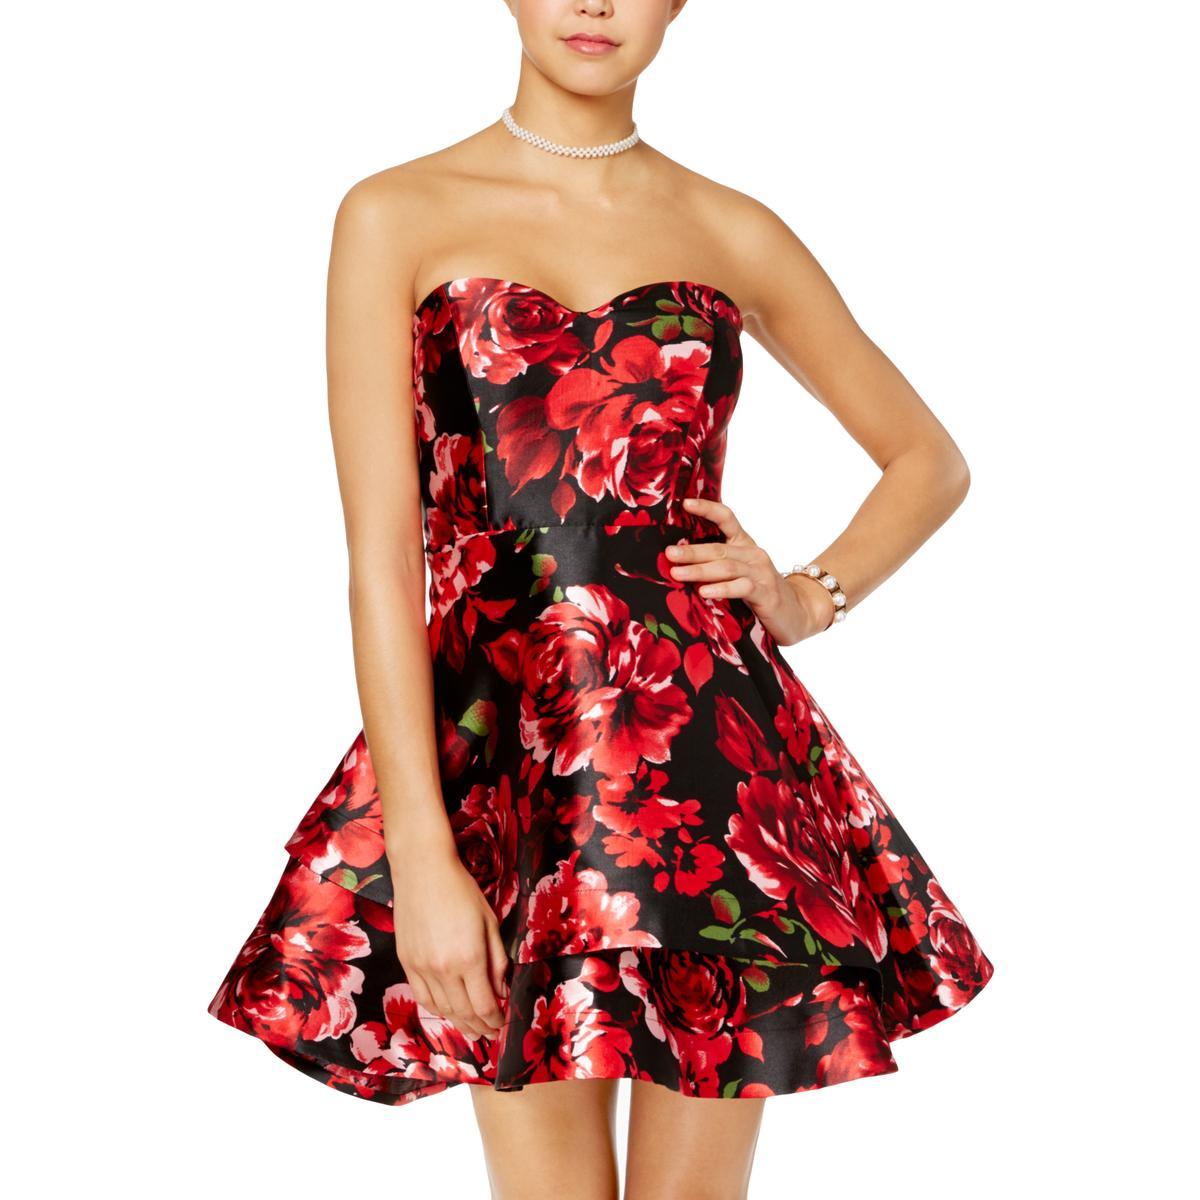 2c39560e2 Details about B. Darlin Womens Black Floral Print Strapless Mini Dress  Juniors 7/8 BHFO 7435